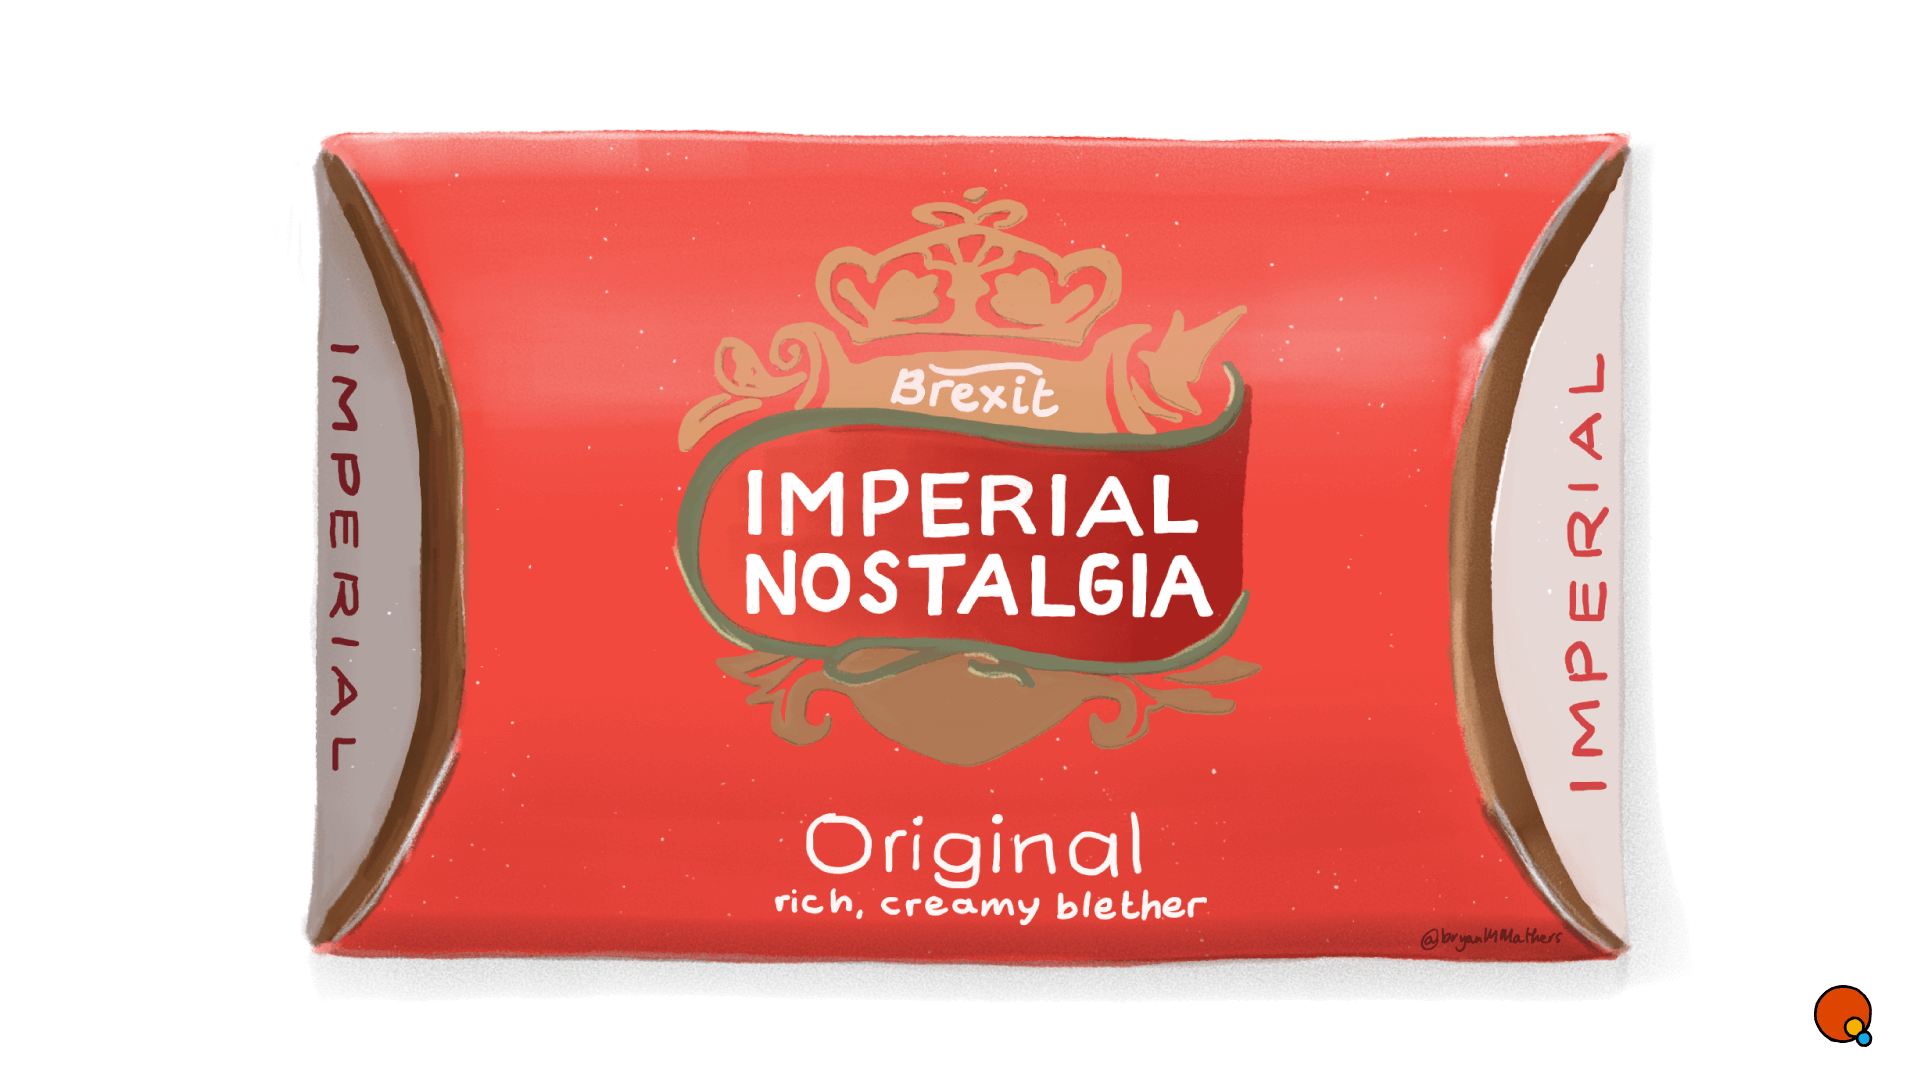 Imperial Nostalgia